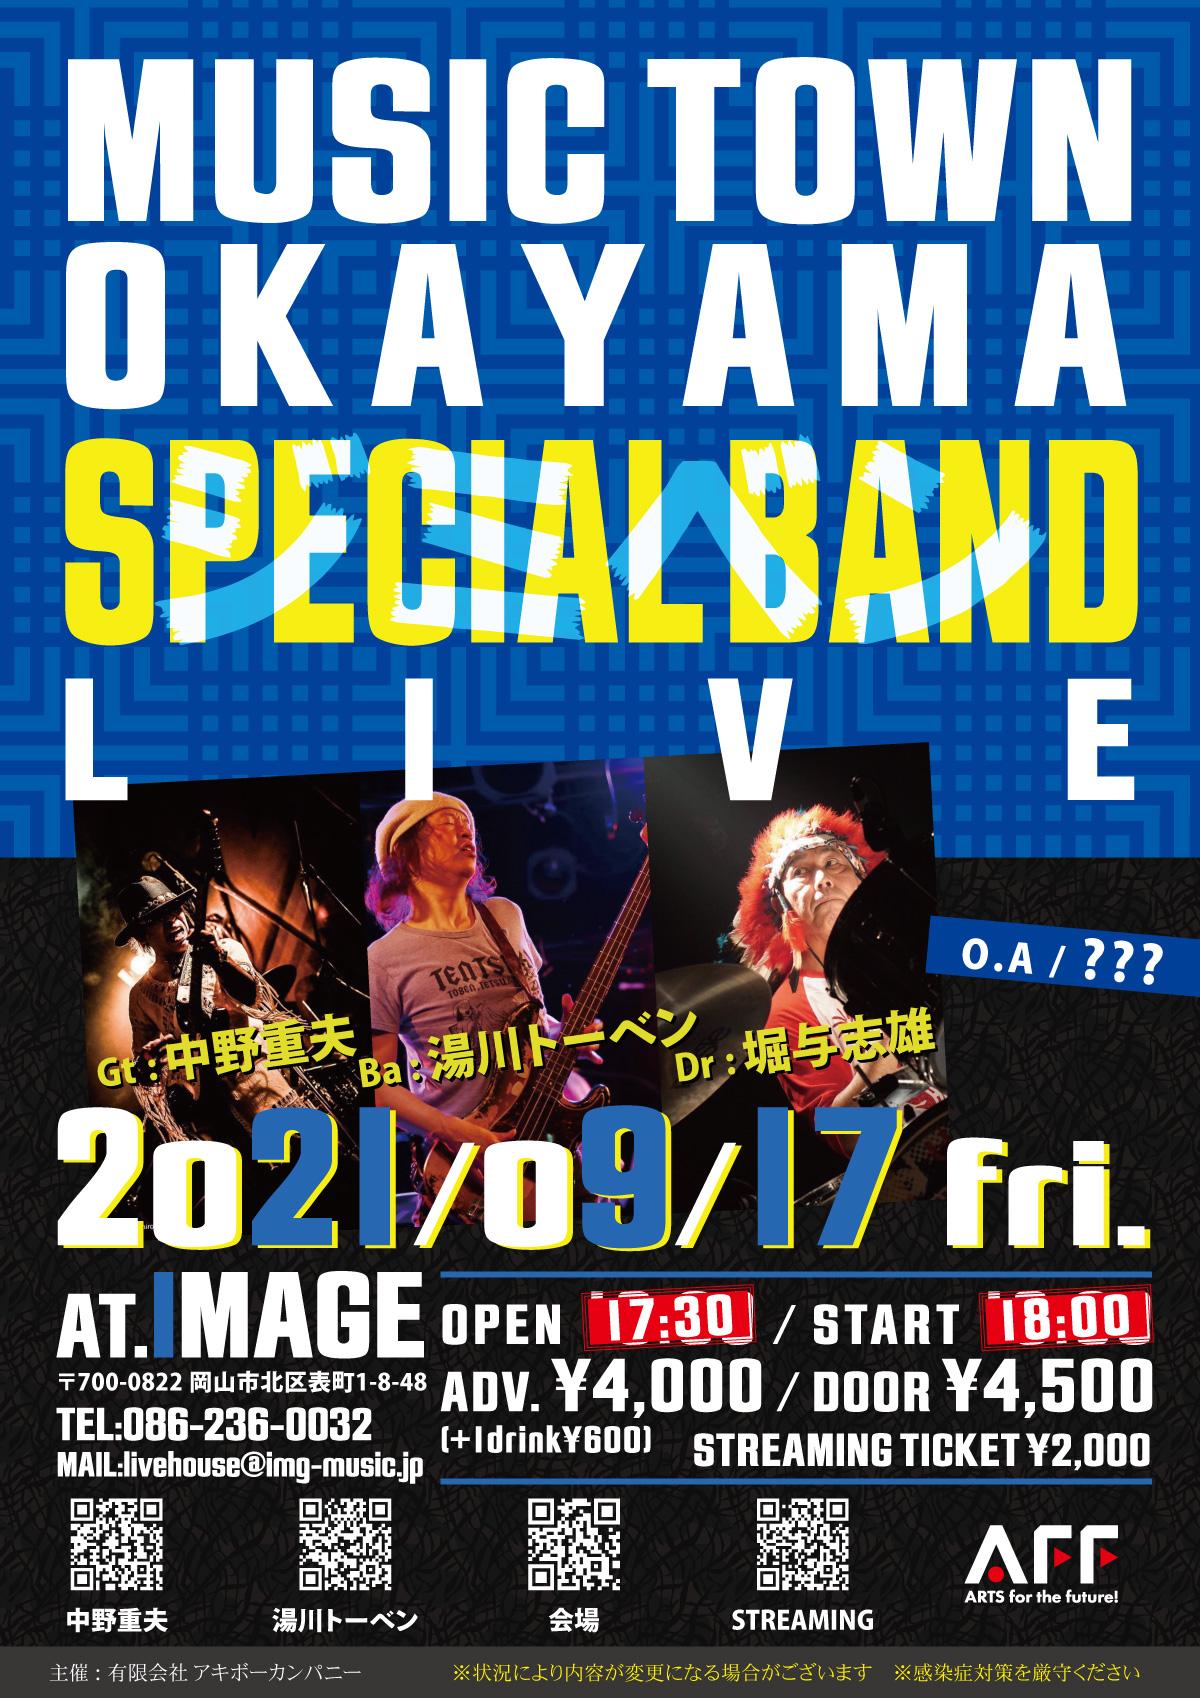 MUSIC TOWN OKAYAMA SPECIAL BAND LIVE